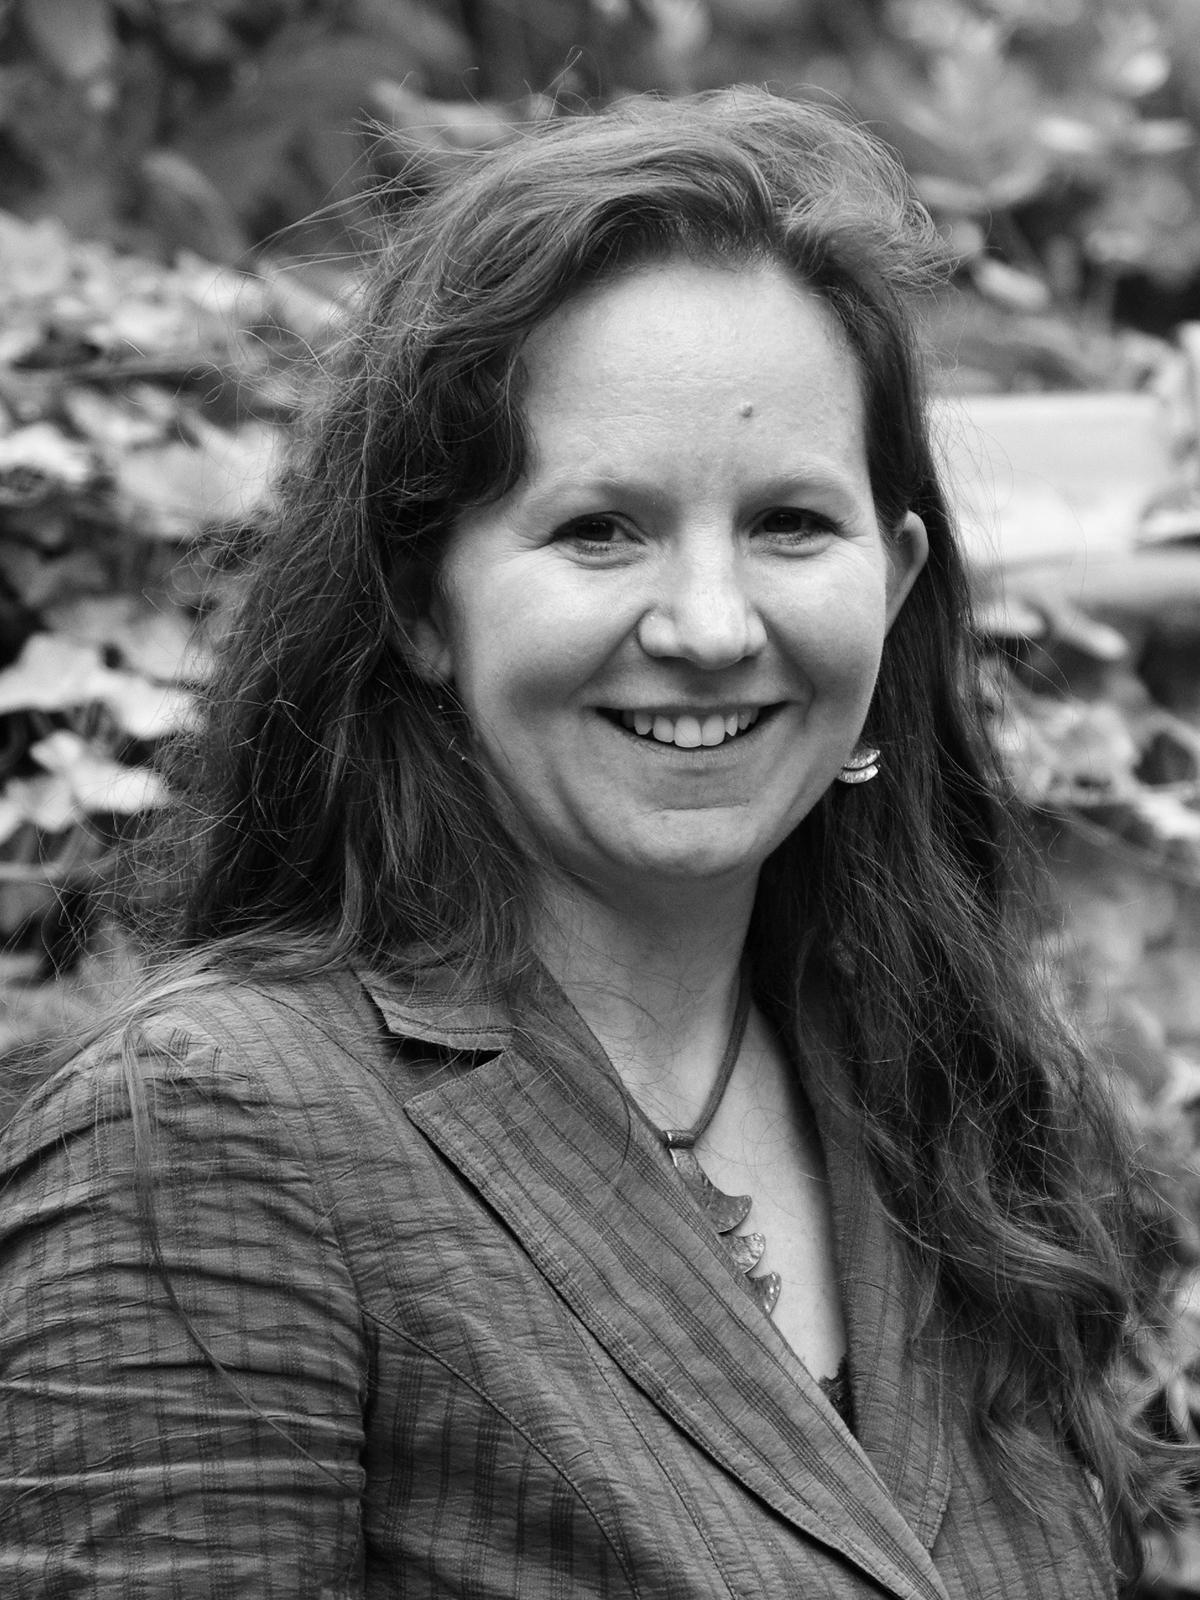 Chantal Vander Vorst